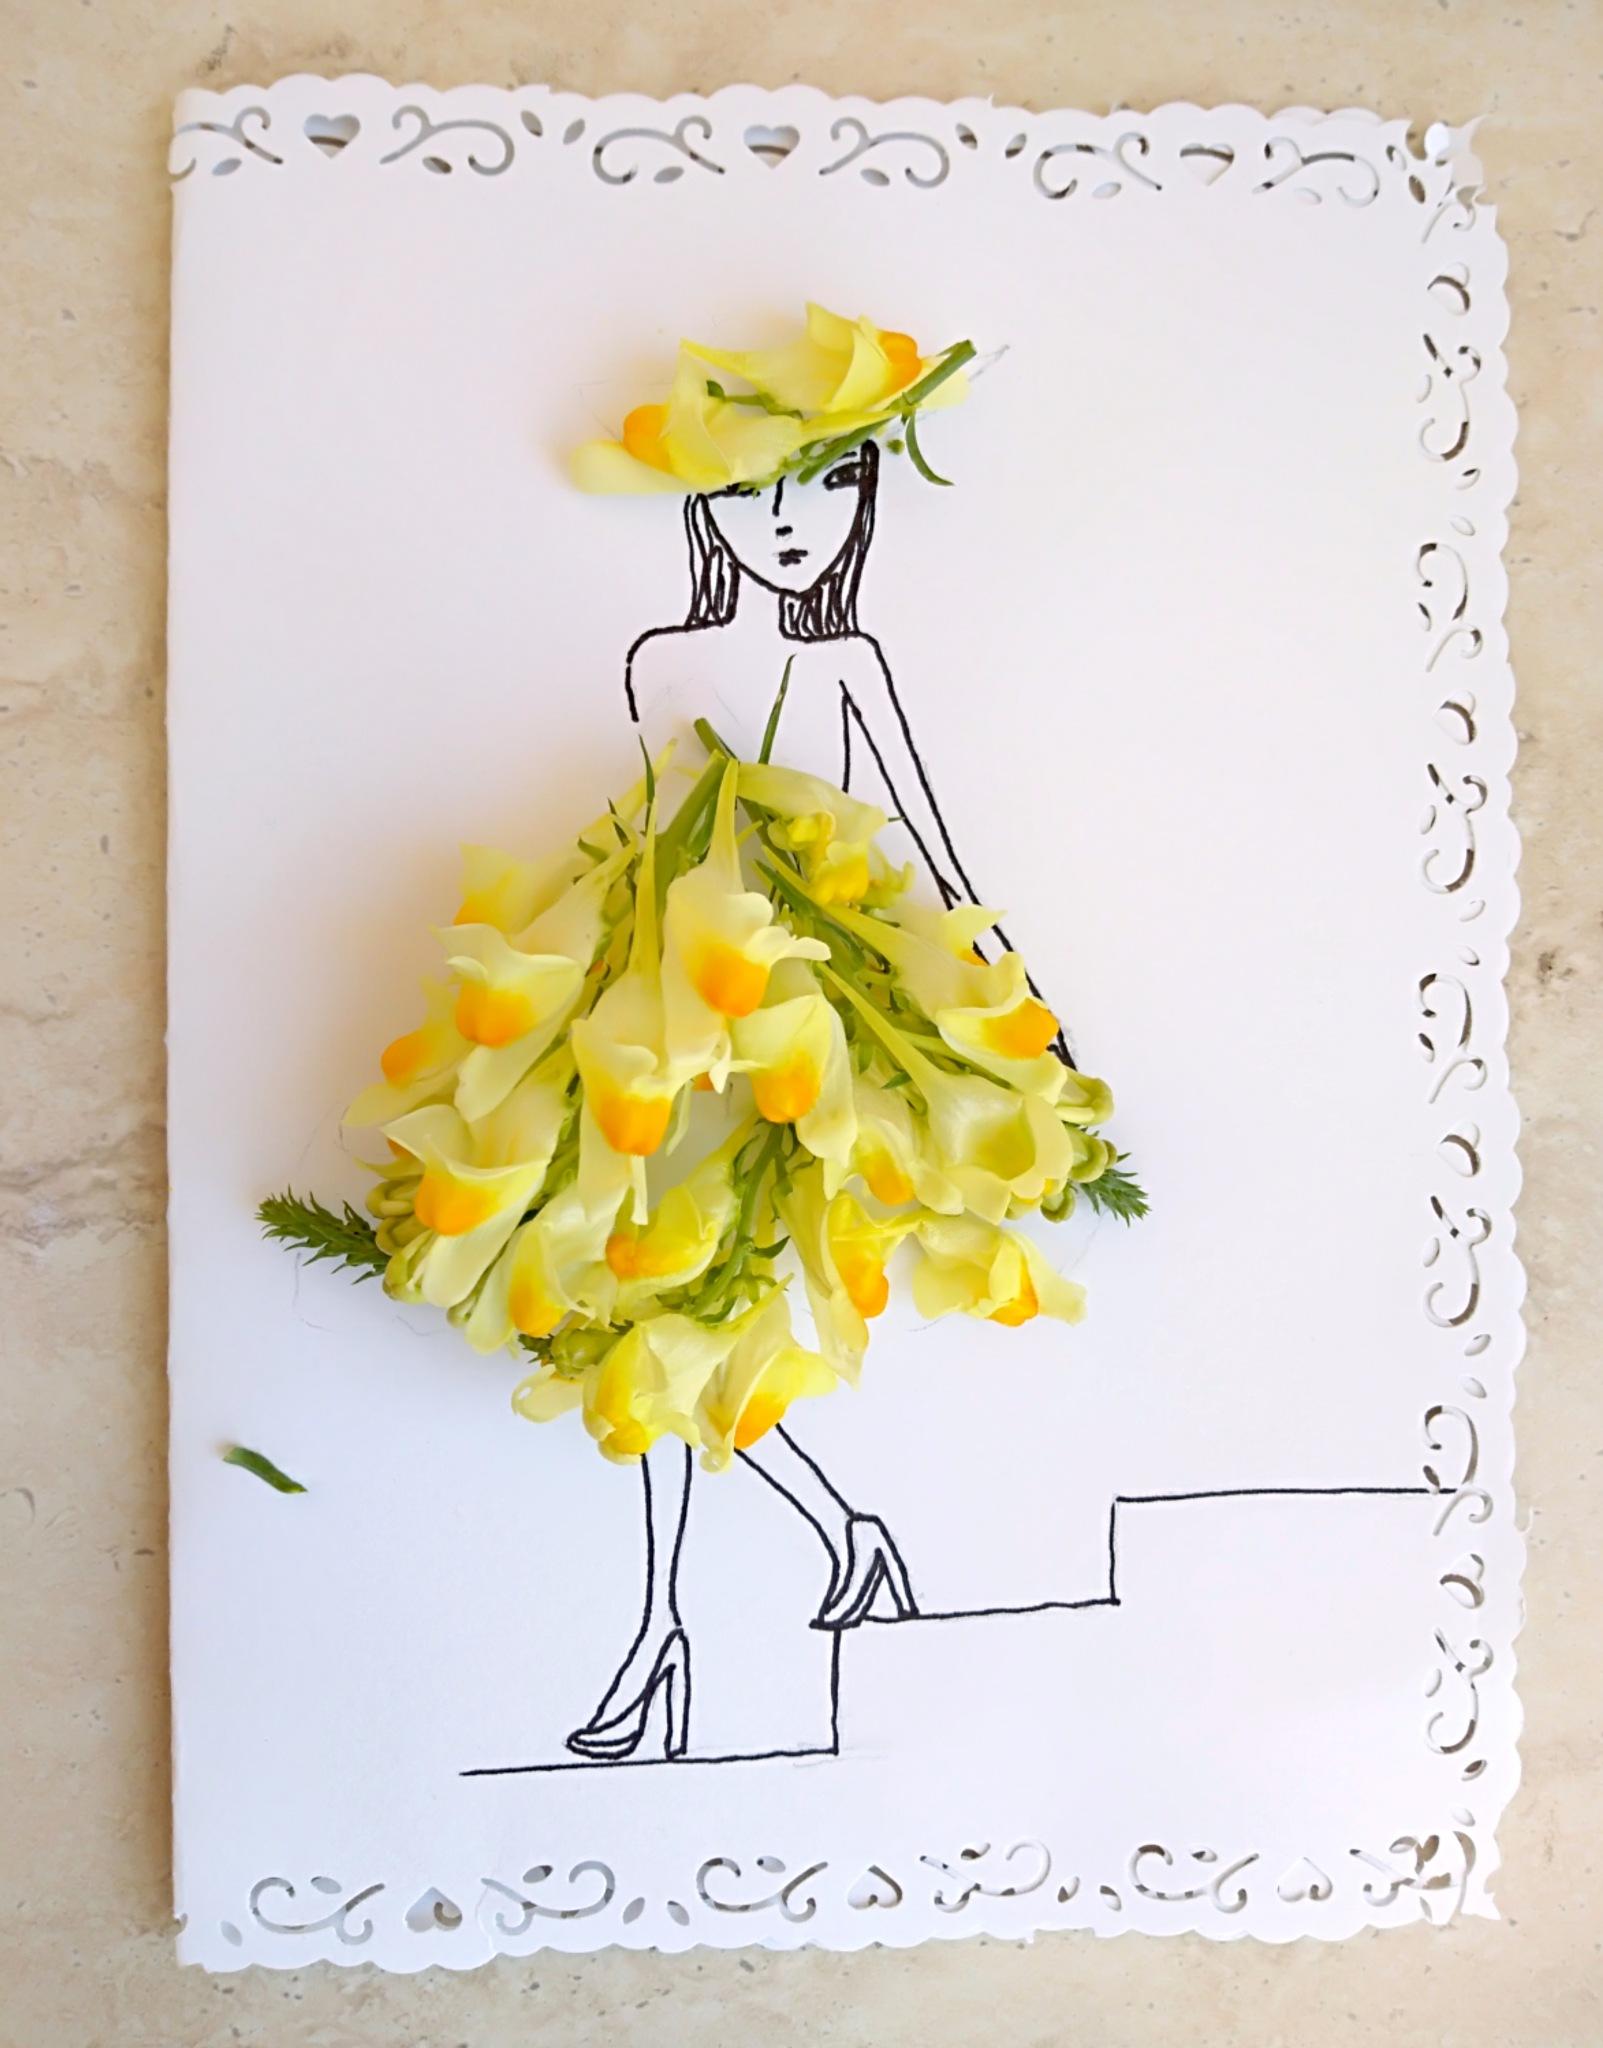 Untitled by Milena Ivanova